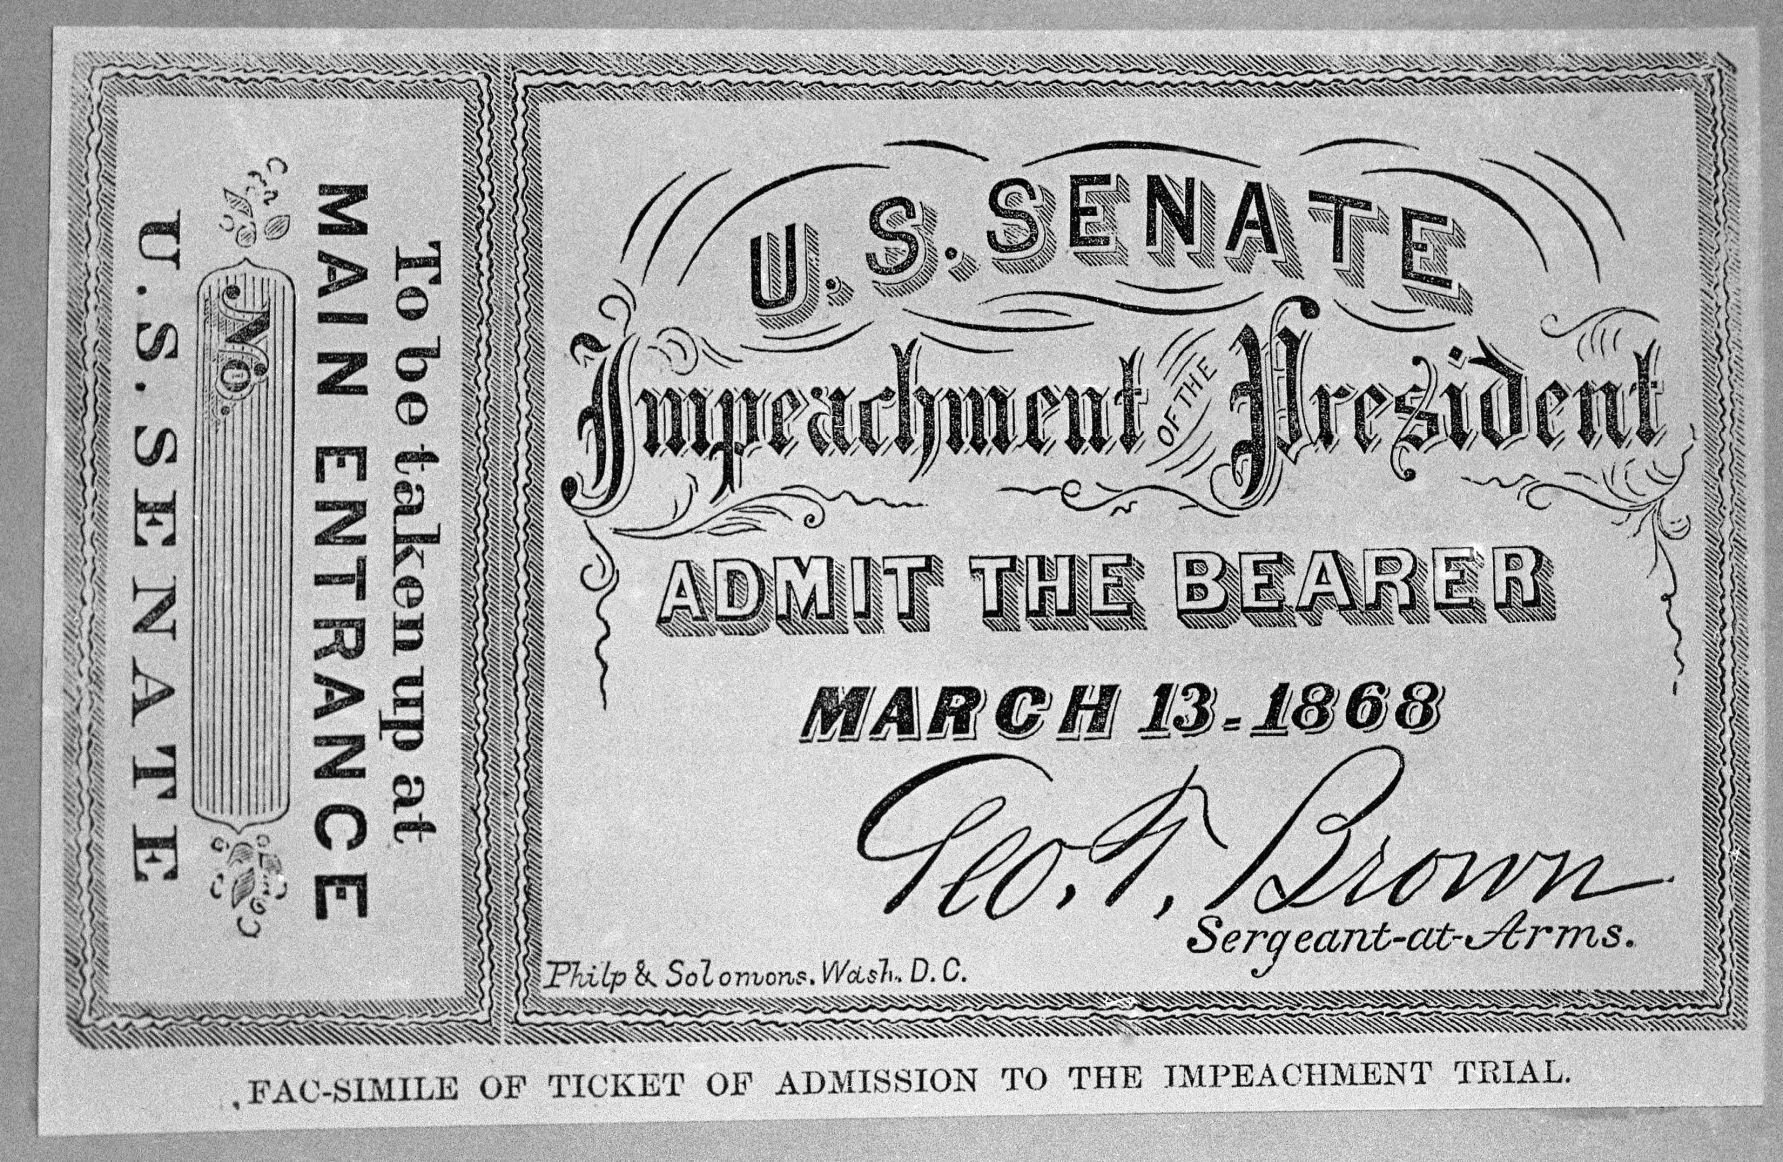 begin impeachment proceedings